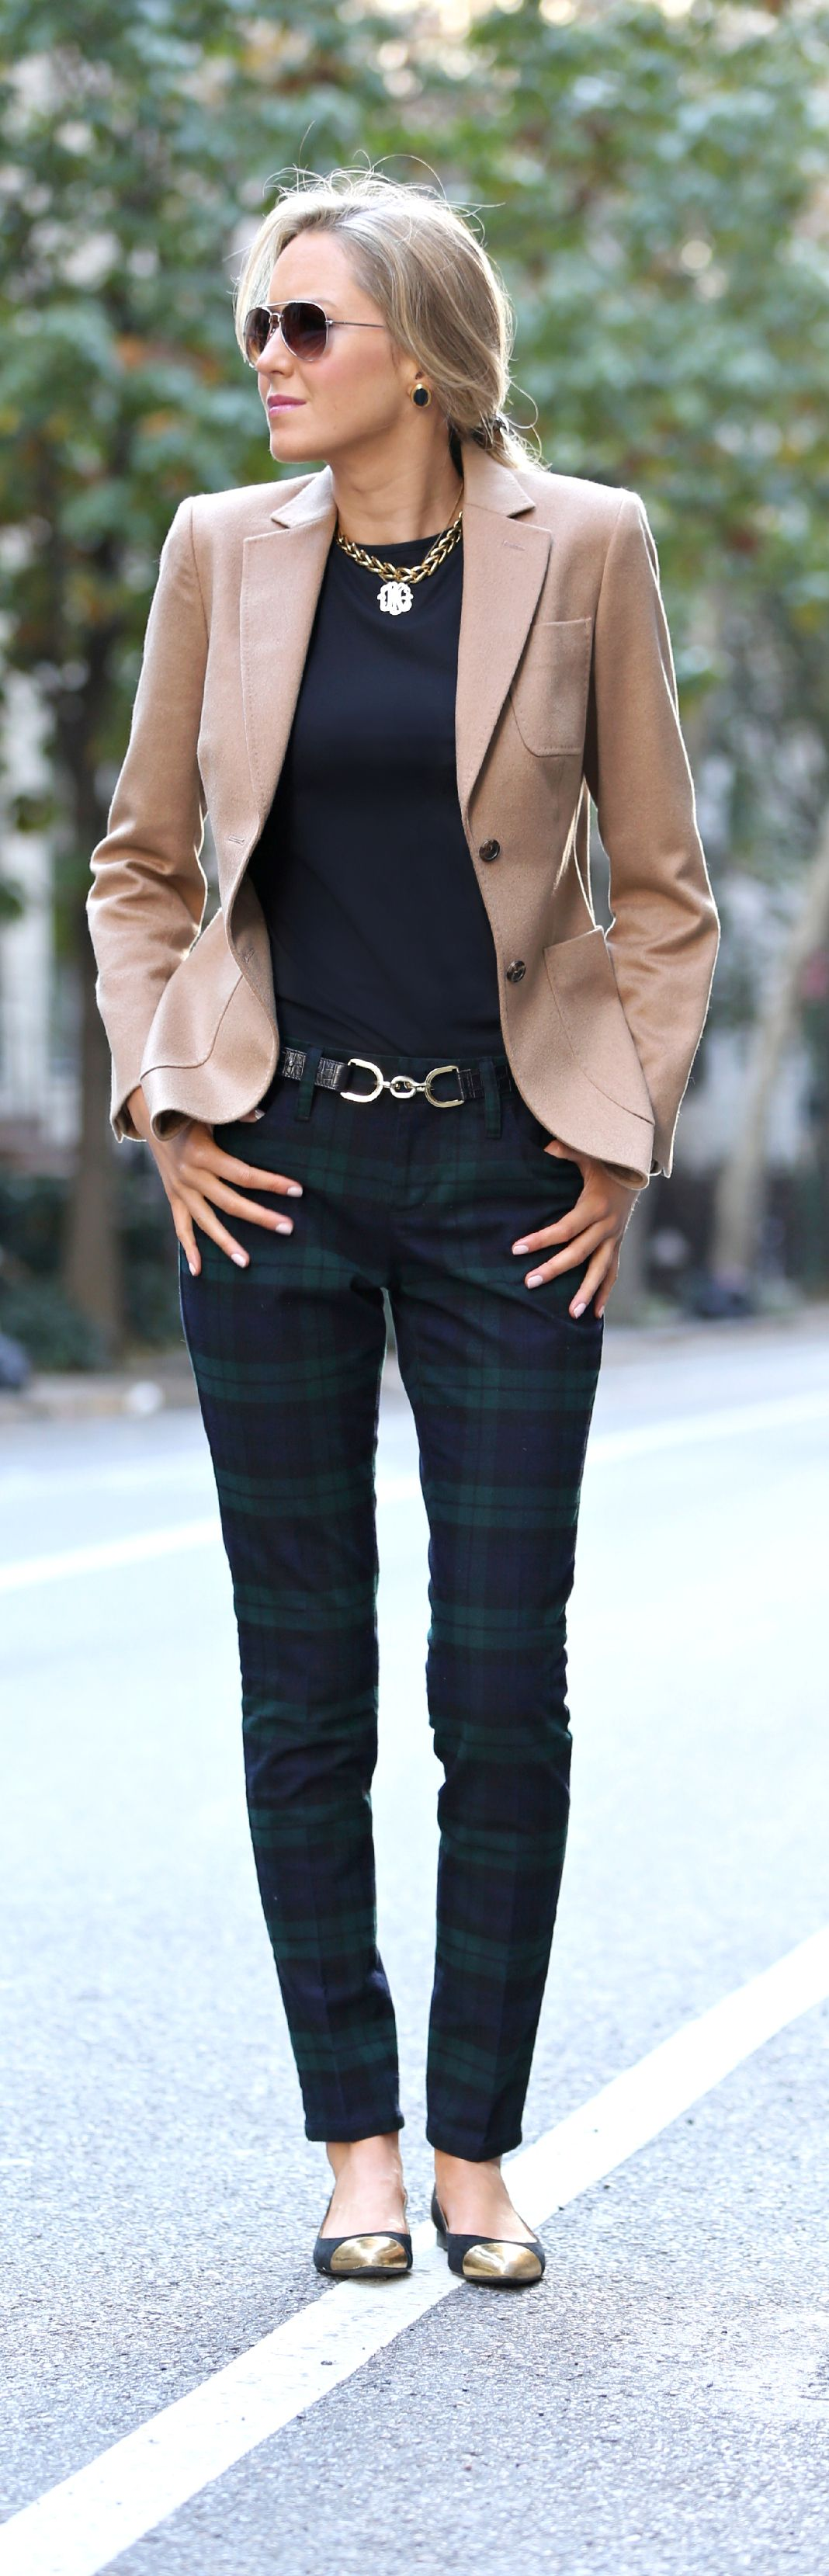 Vestido negro saco beige